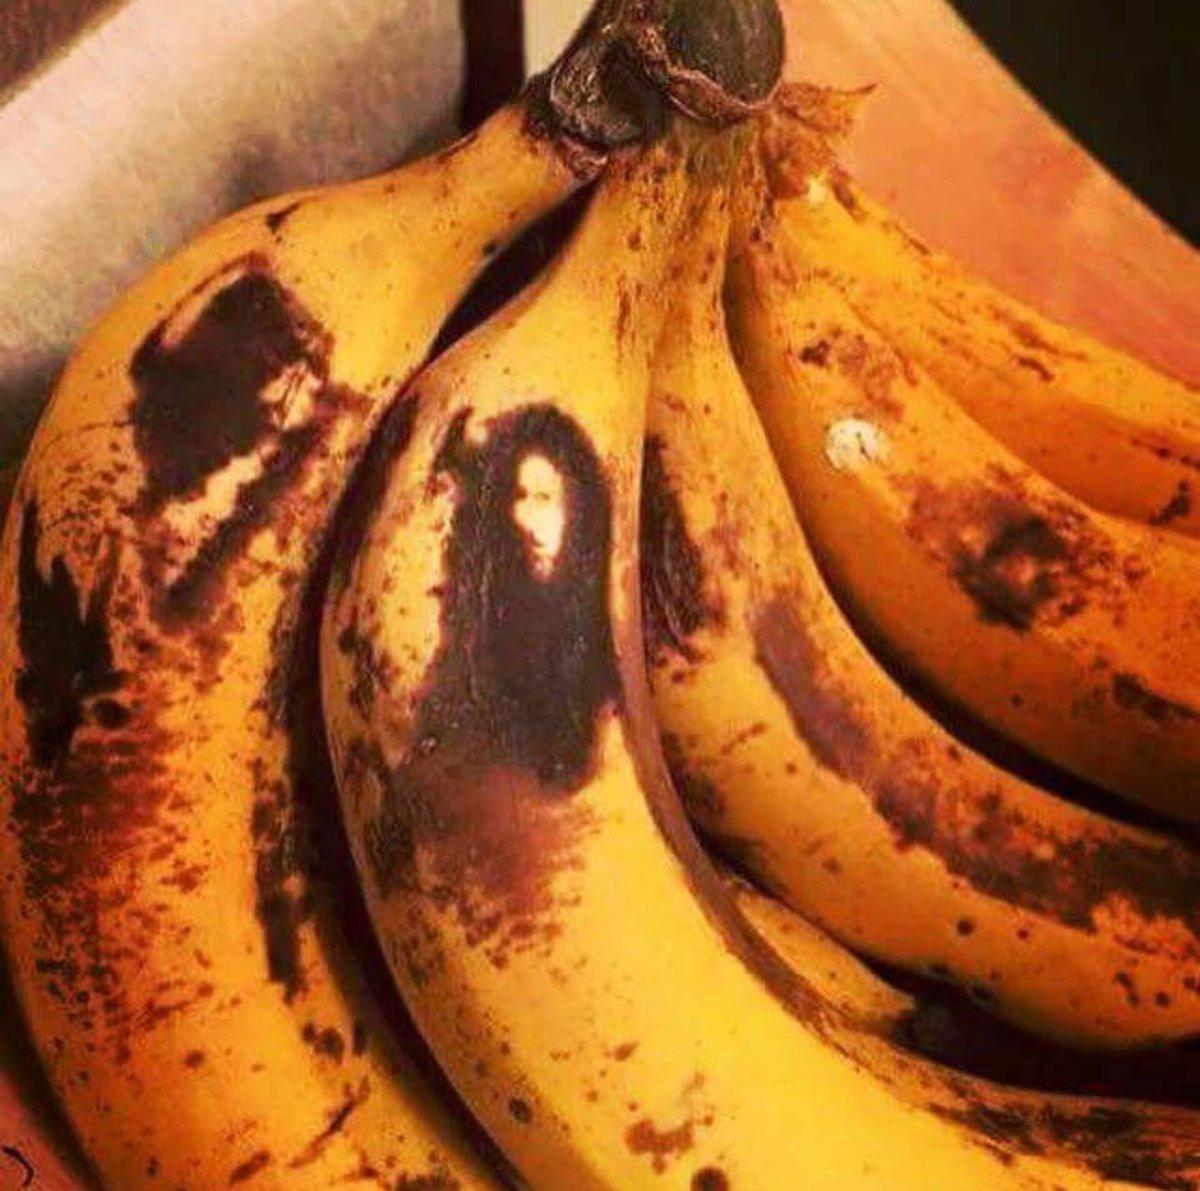 Bob Marley apareceu pra mim na banana hoje. https://t.co/ks3dcrvw9u